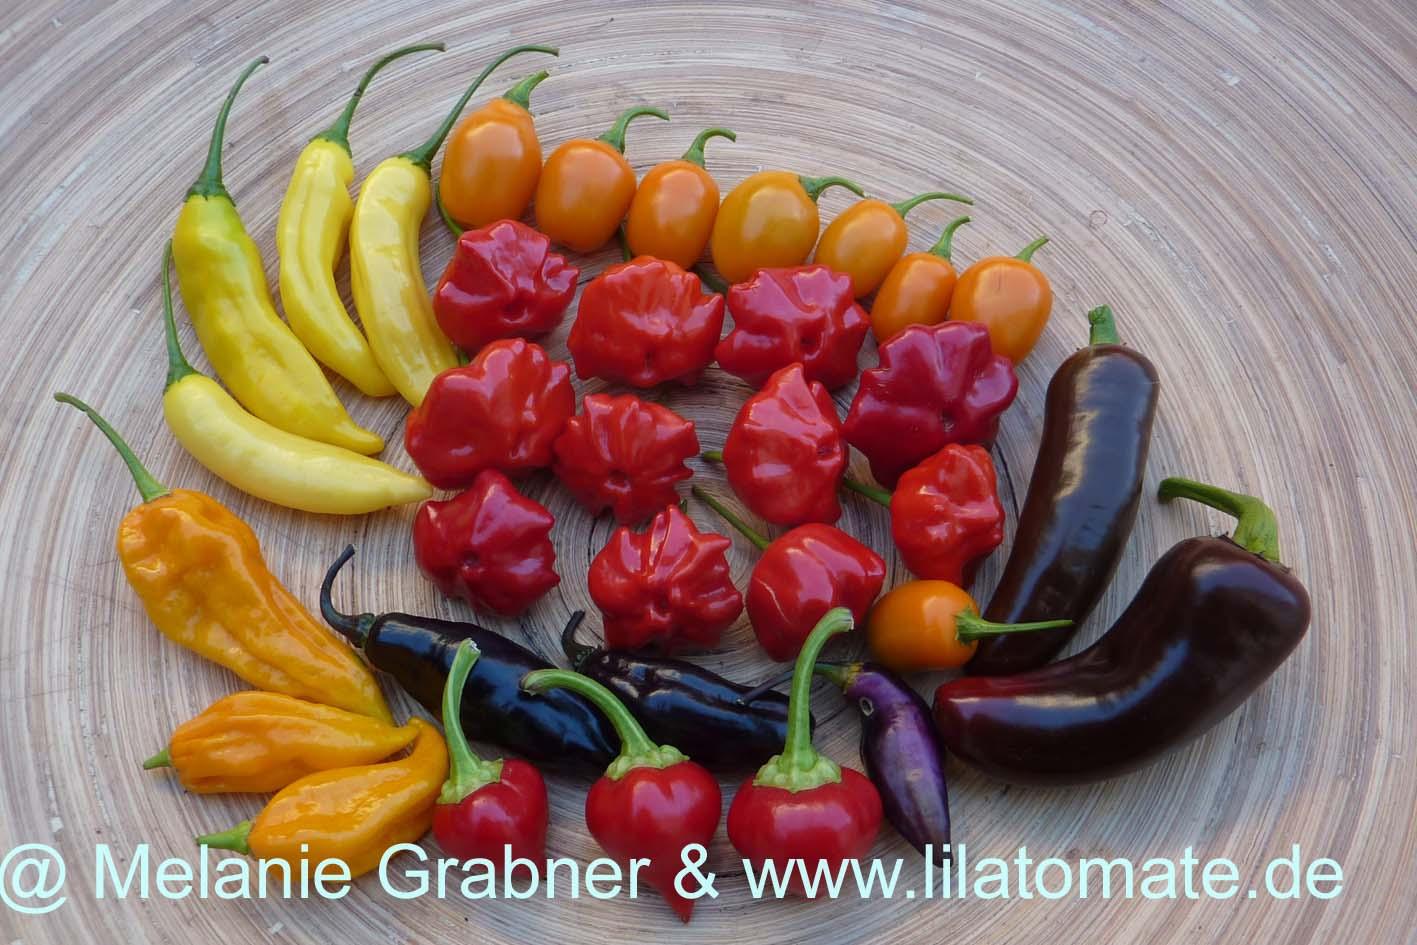 Chili Sortenmischung 'Chilimischung' Saatgut